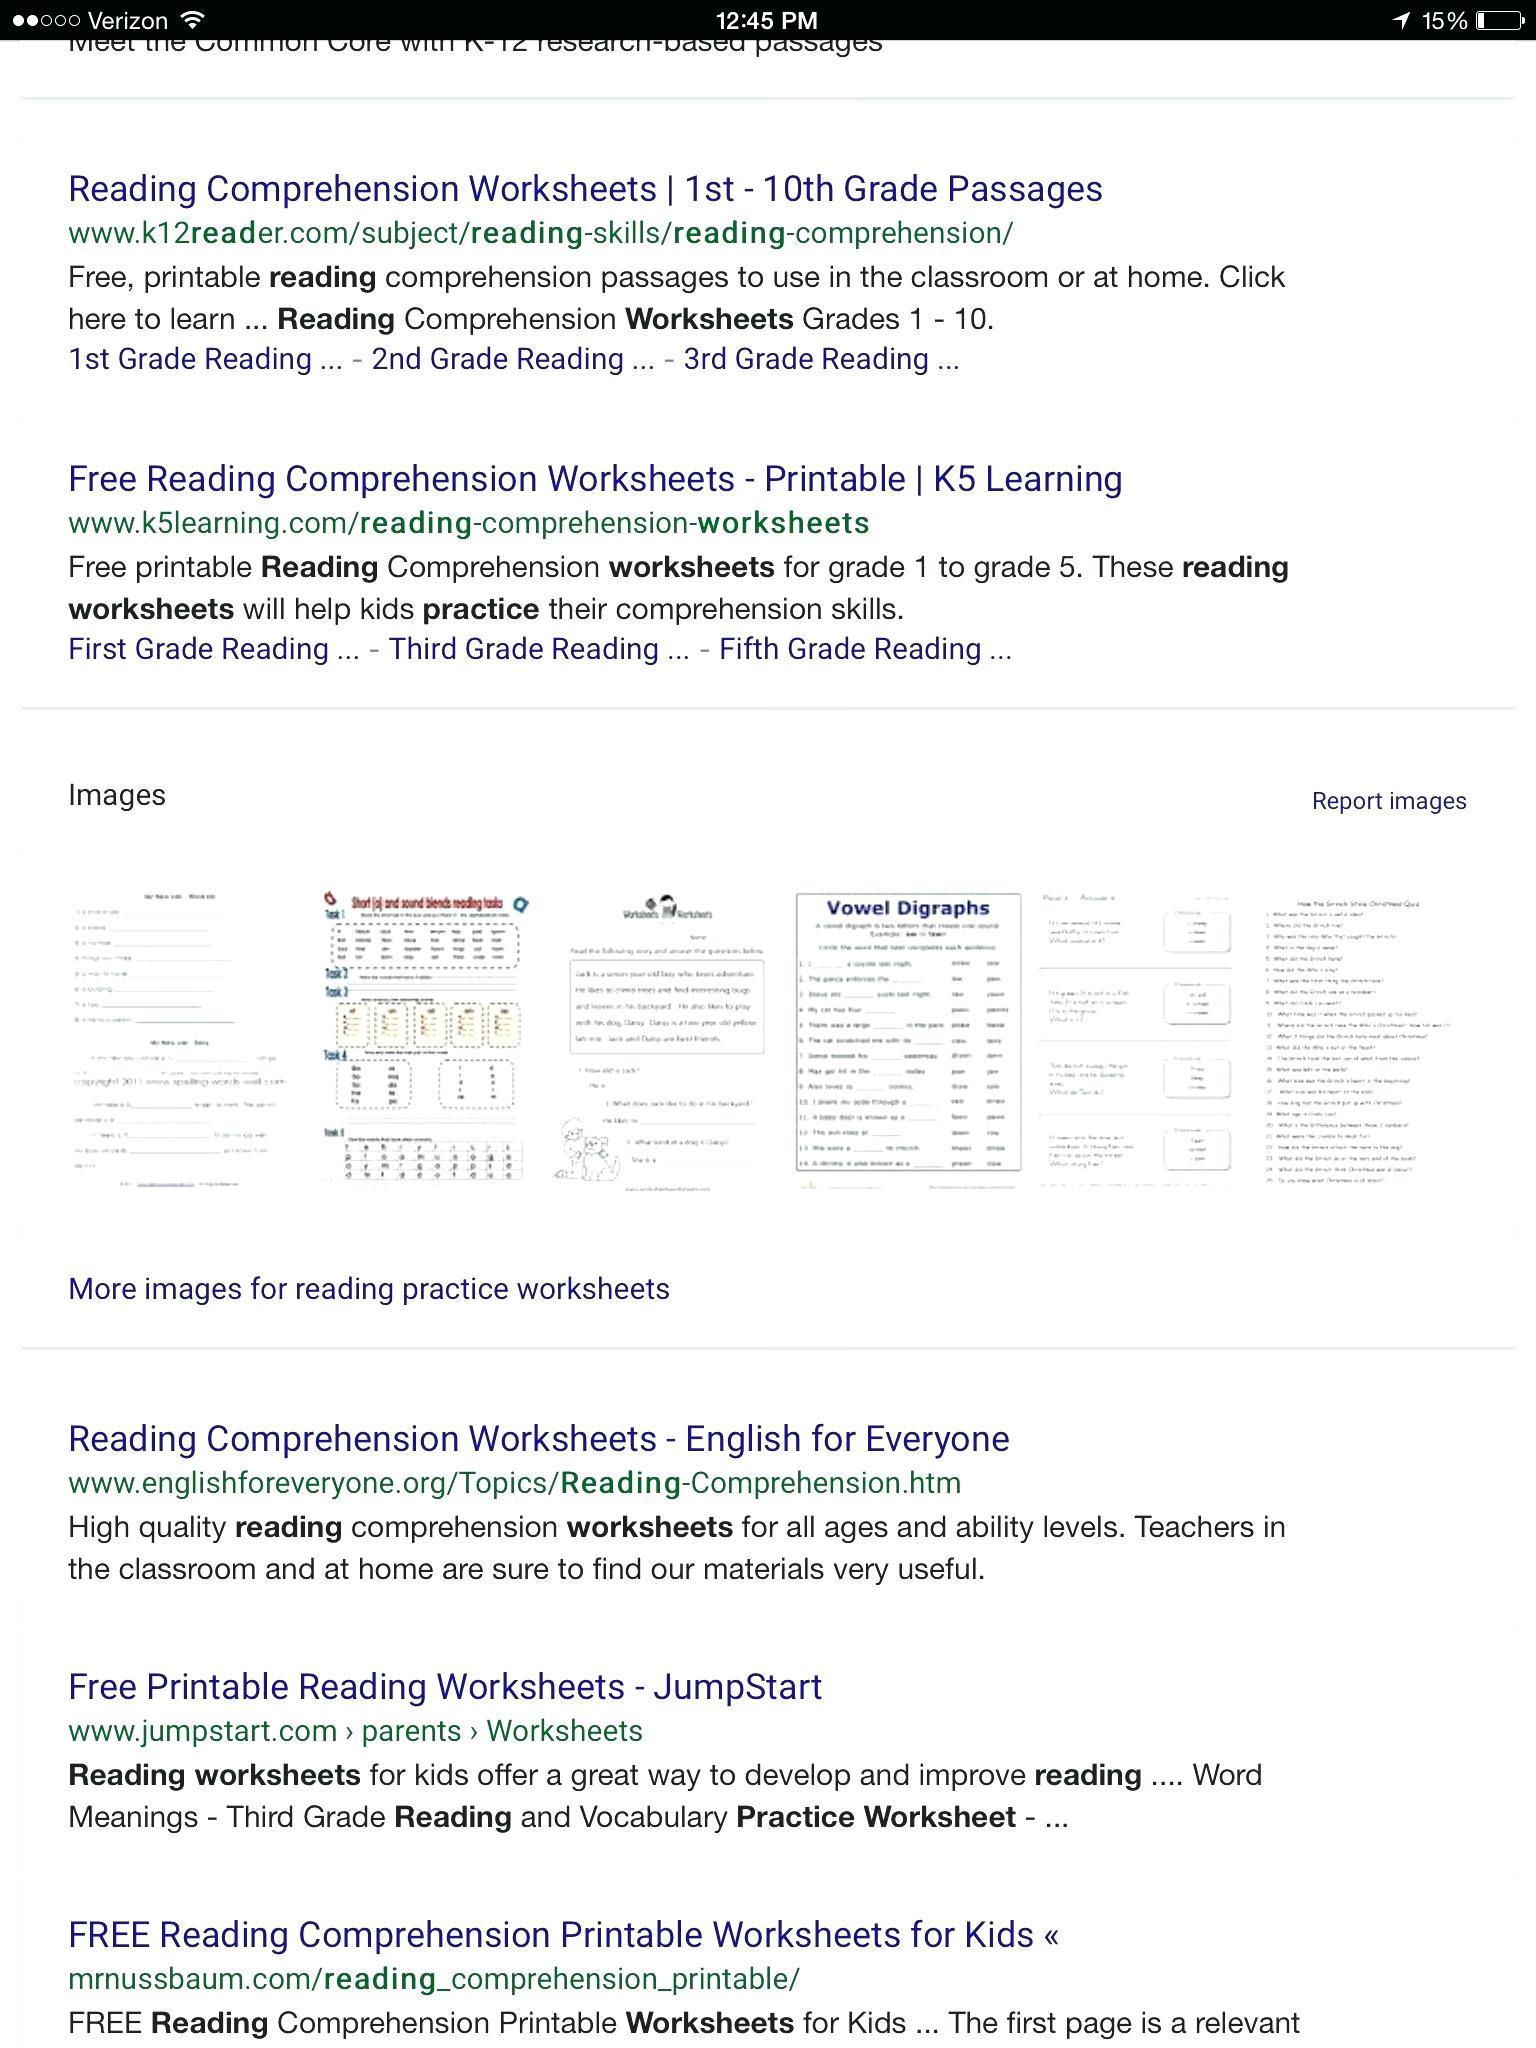 3 Spelling Worksheets Third Grade 3 Spelling Words